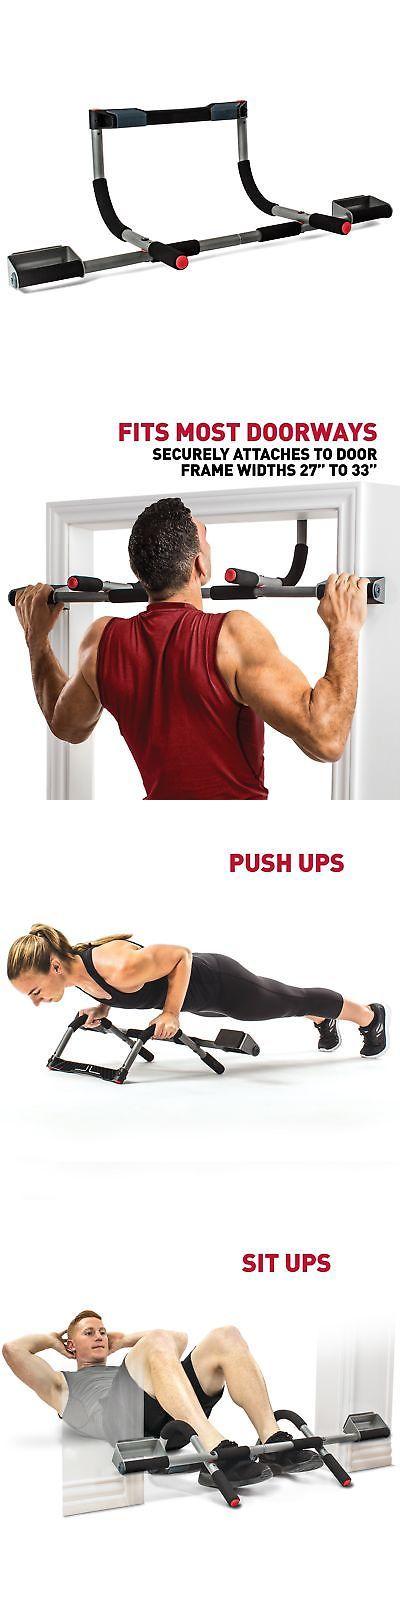 Diy Exercise Calendar : Best pull up bar ideas on pinterest diy